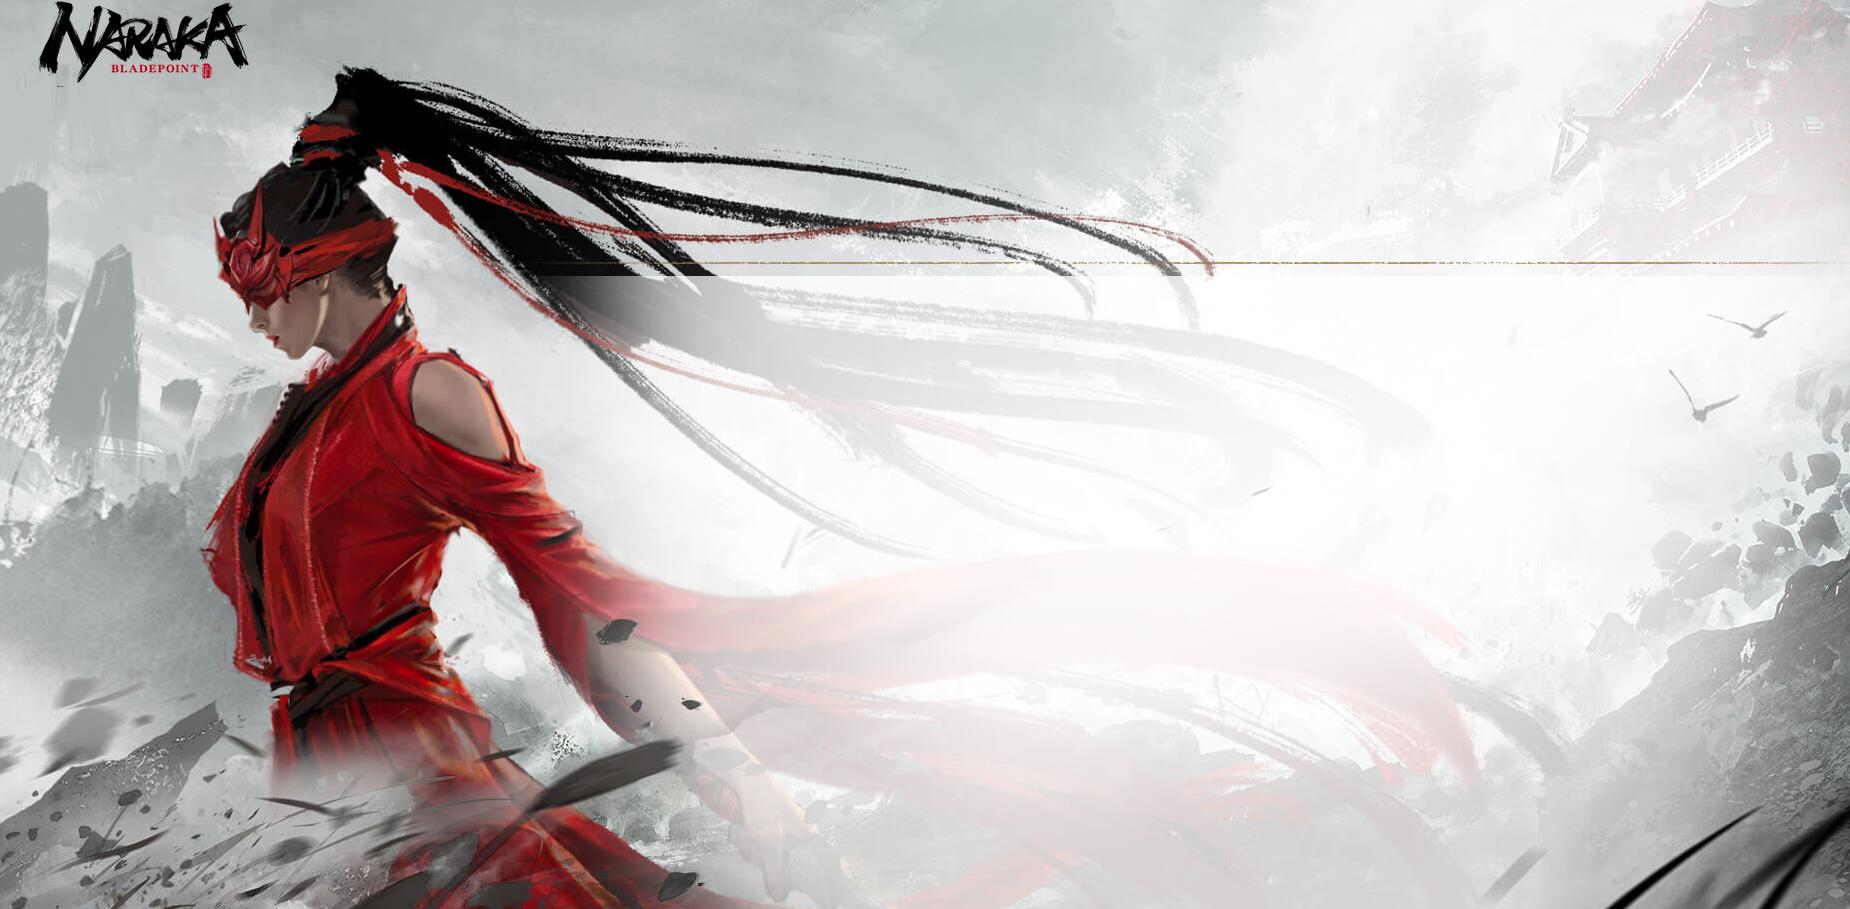 A Forerunner from Naraka: Bladepoint